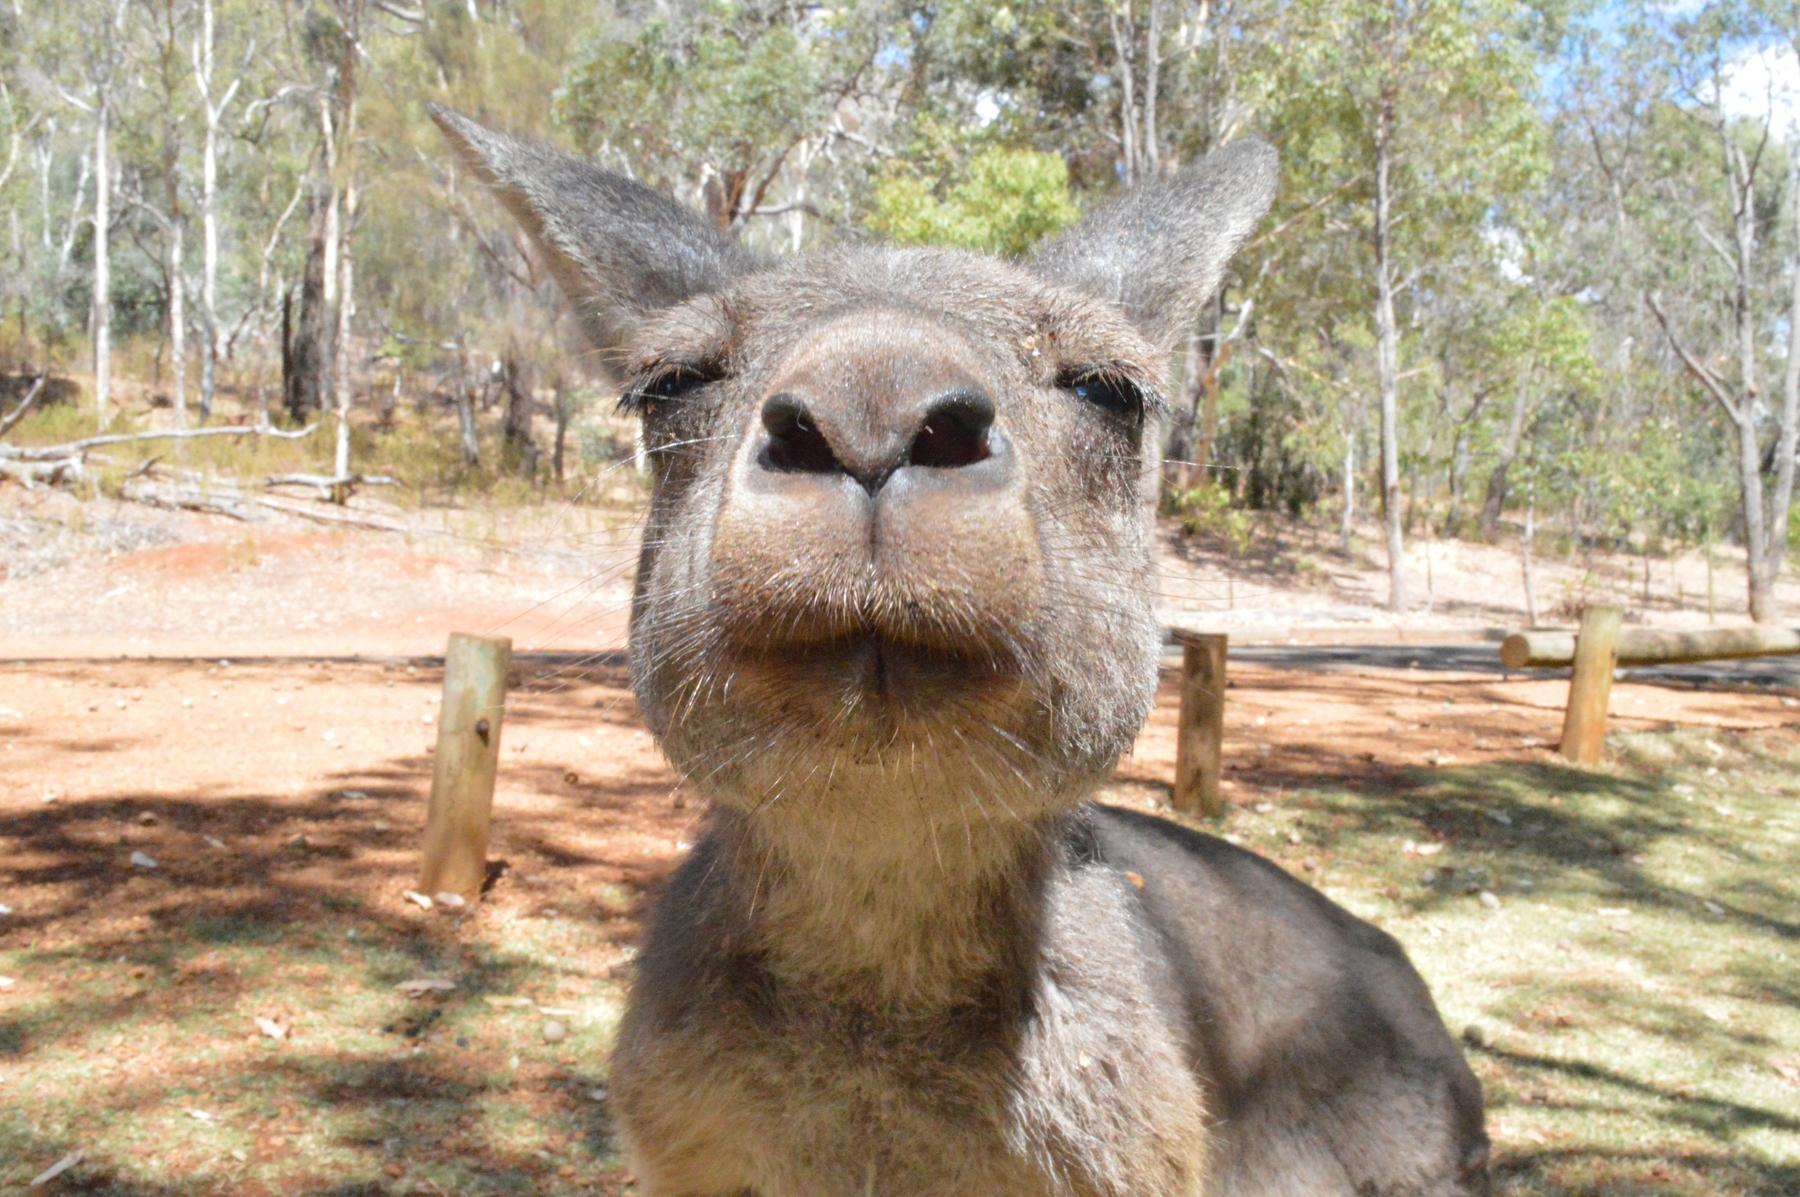 Get up close to the kangaroos of Kangaroo Island on a wildlife tour